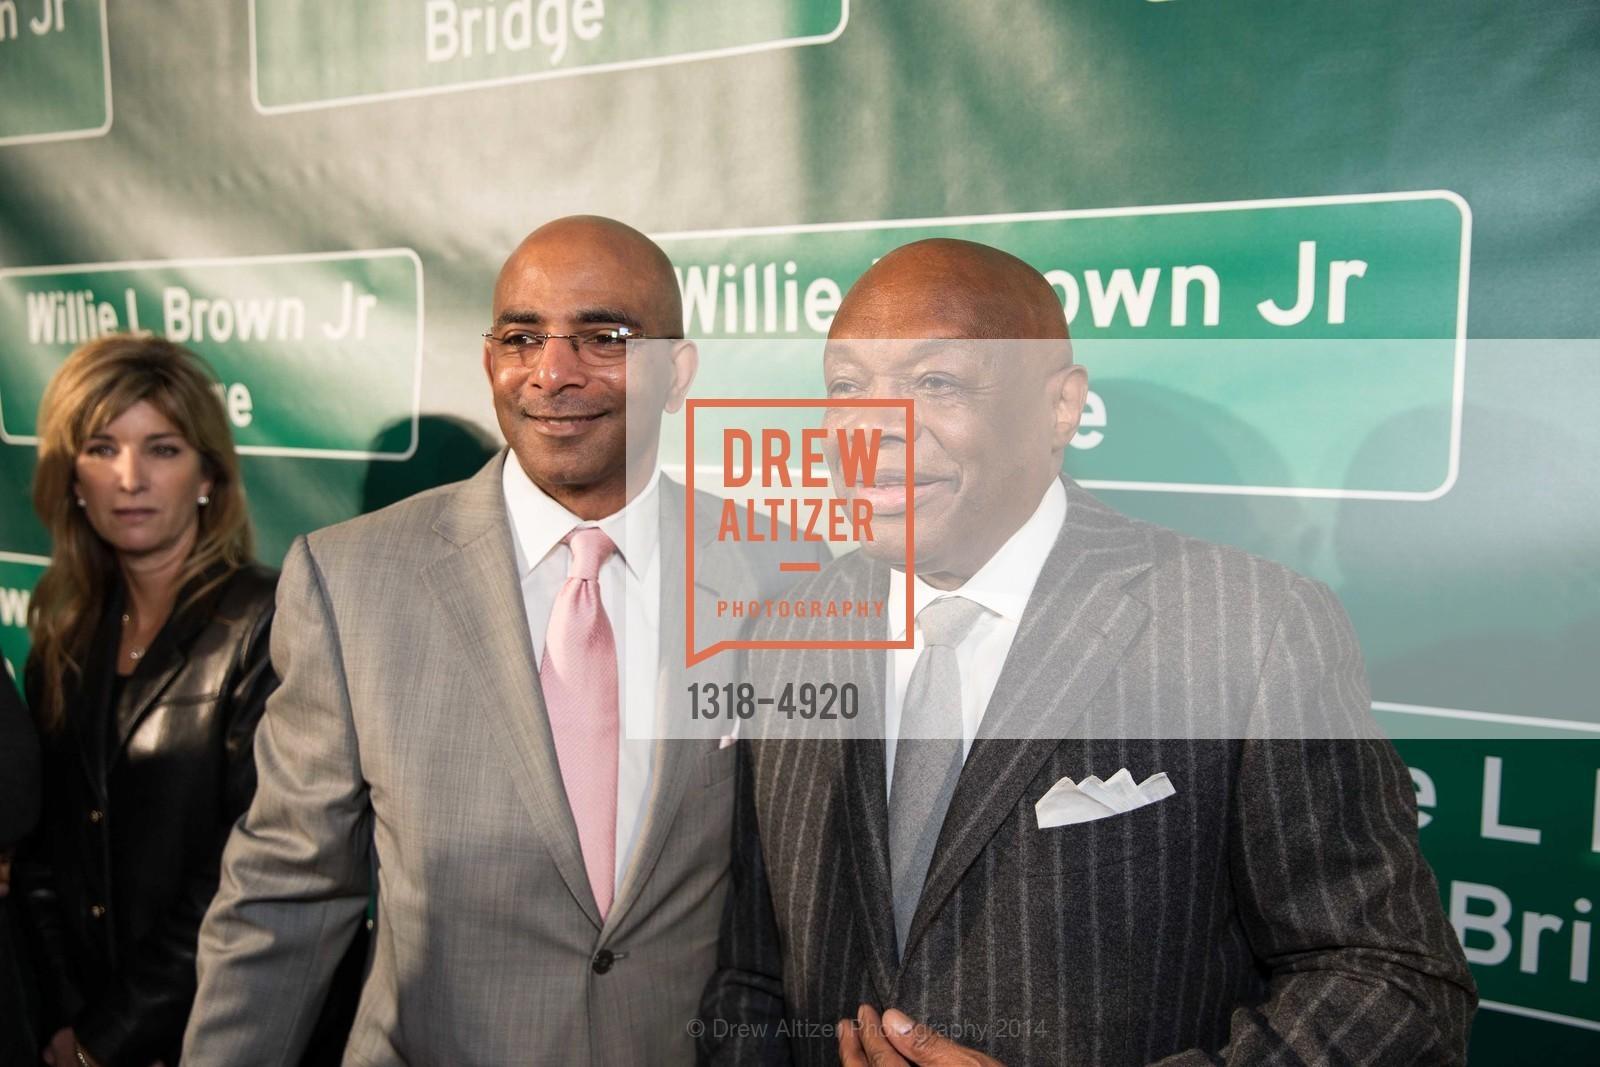 Steve Bowdry, Willie Brown, Photo #1318-4920